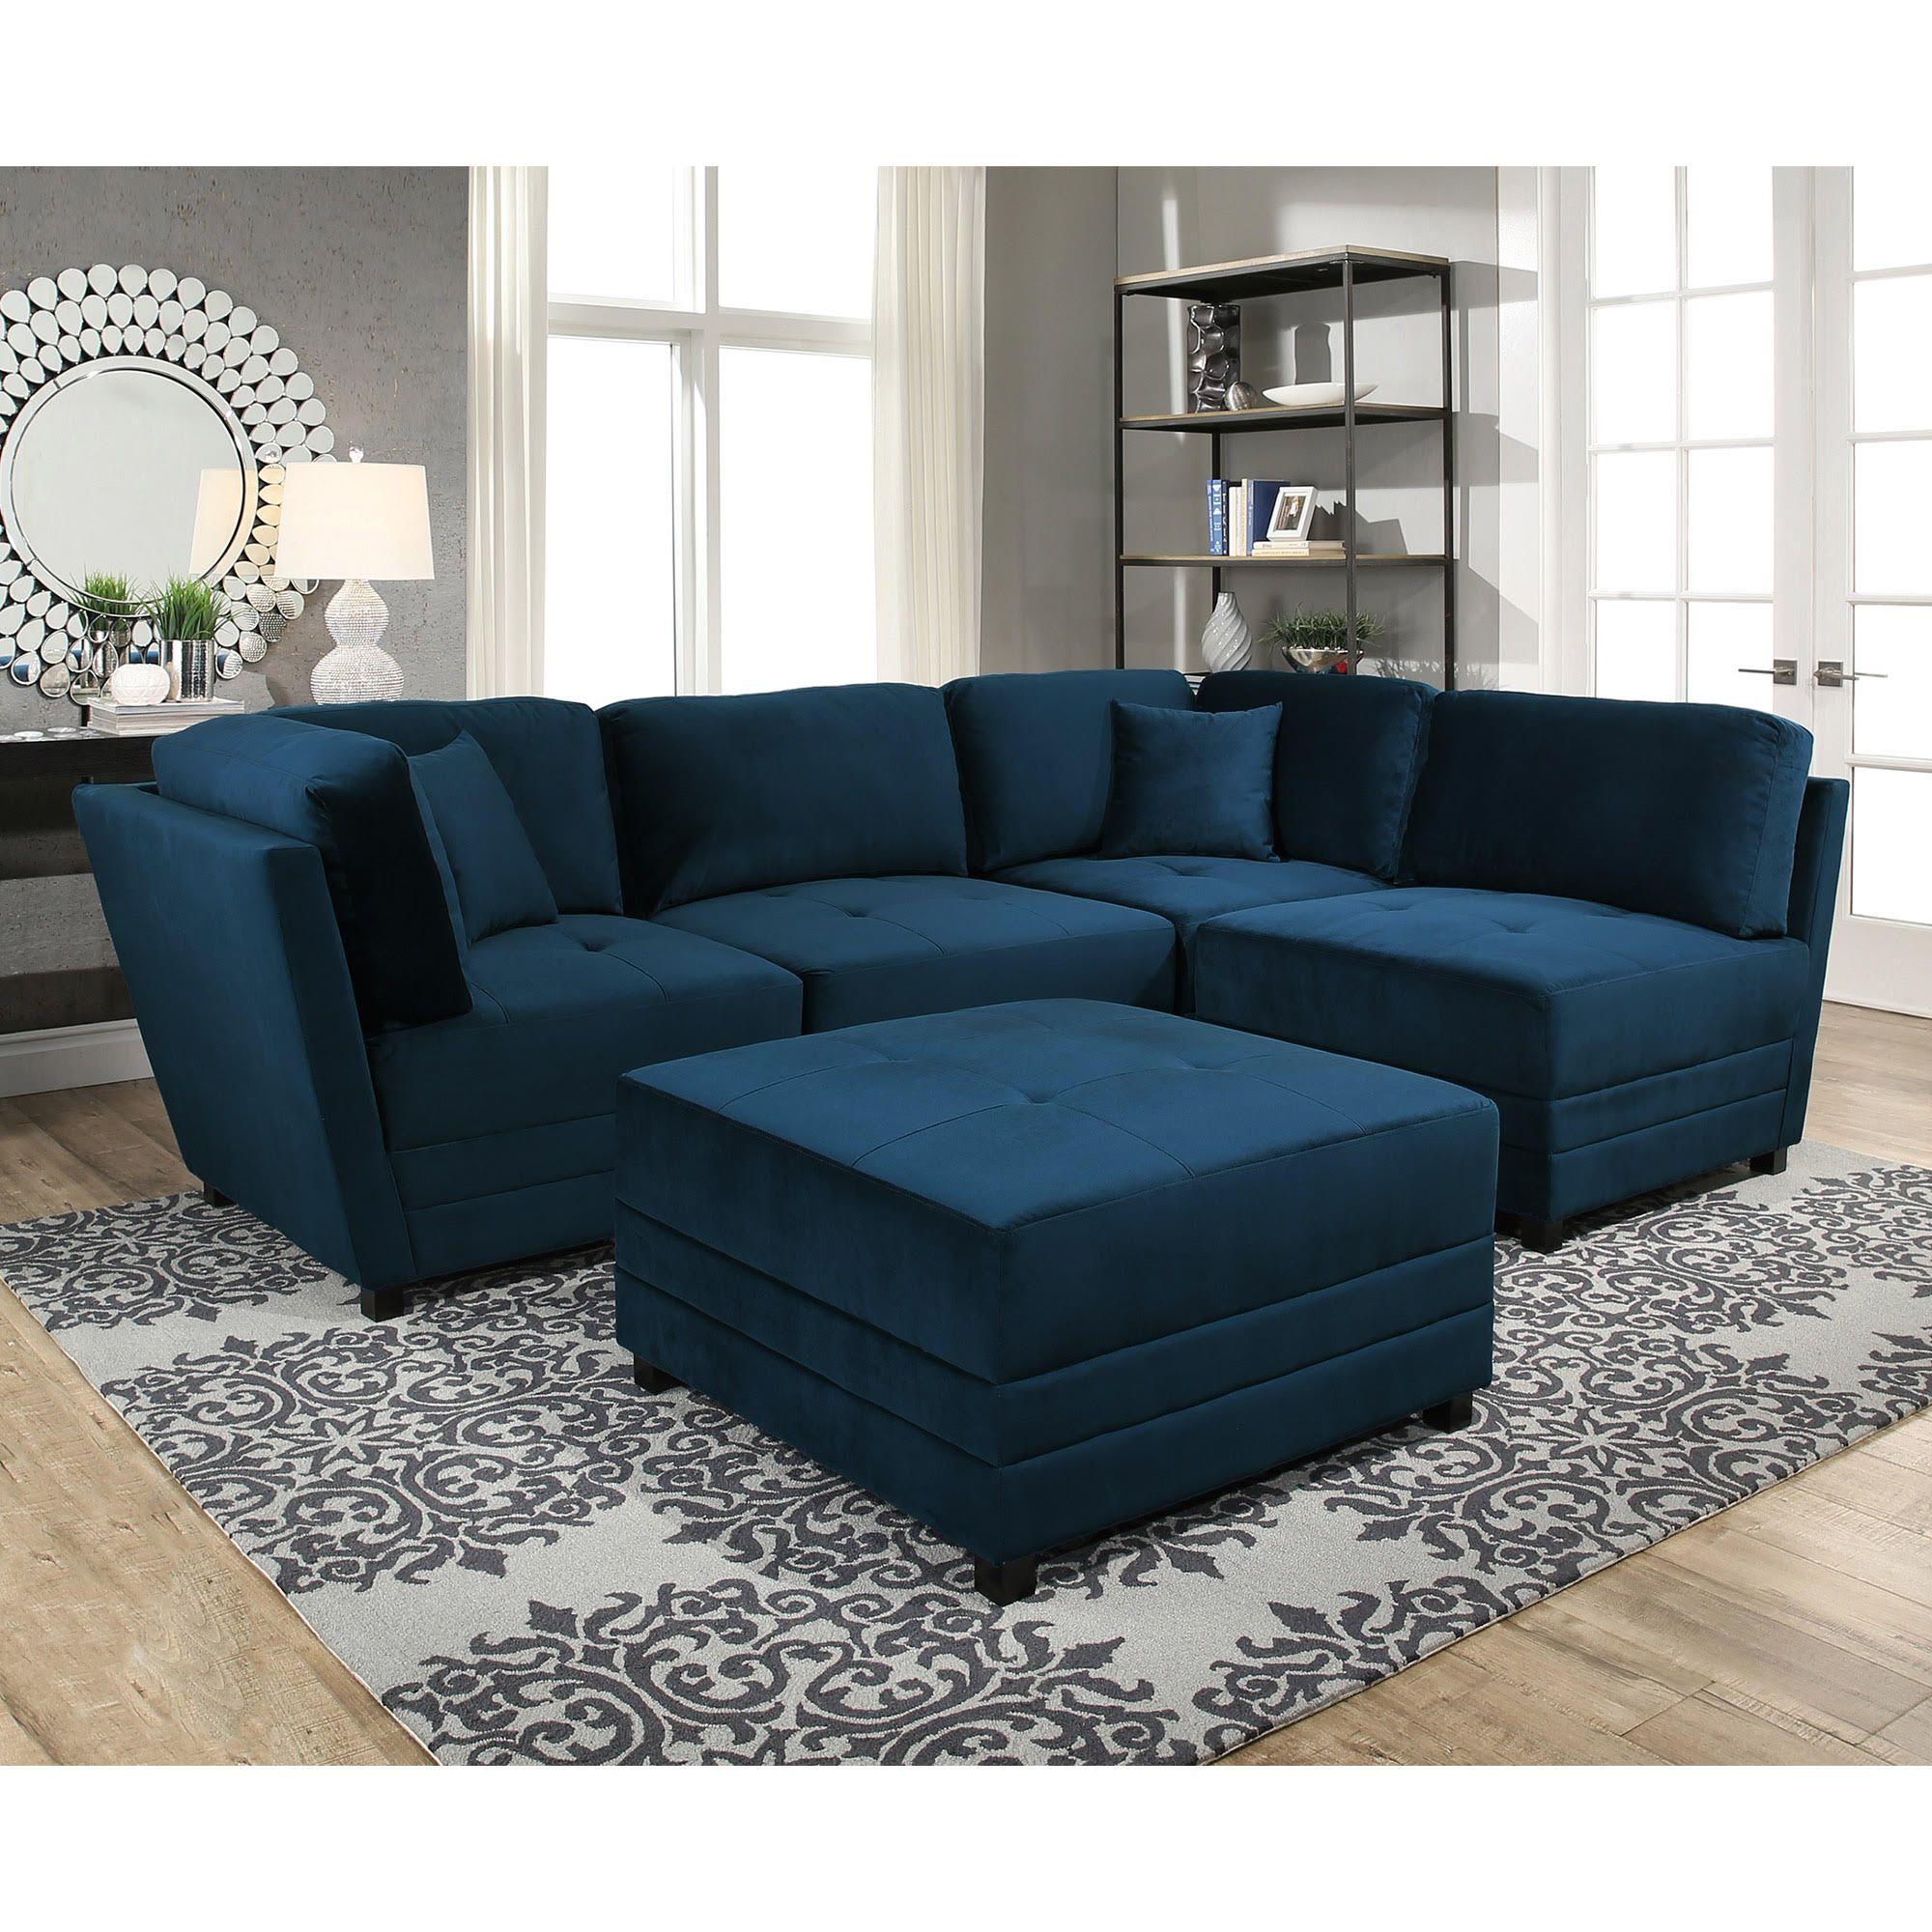 Leyla 5-piece Fabric Modular Sectional - Blue